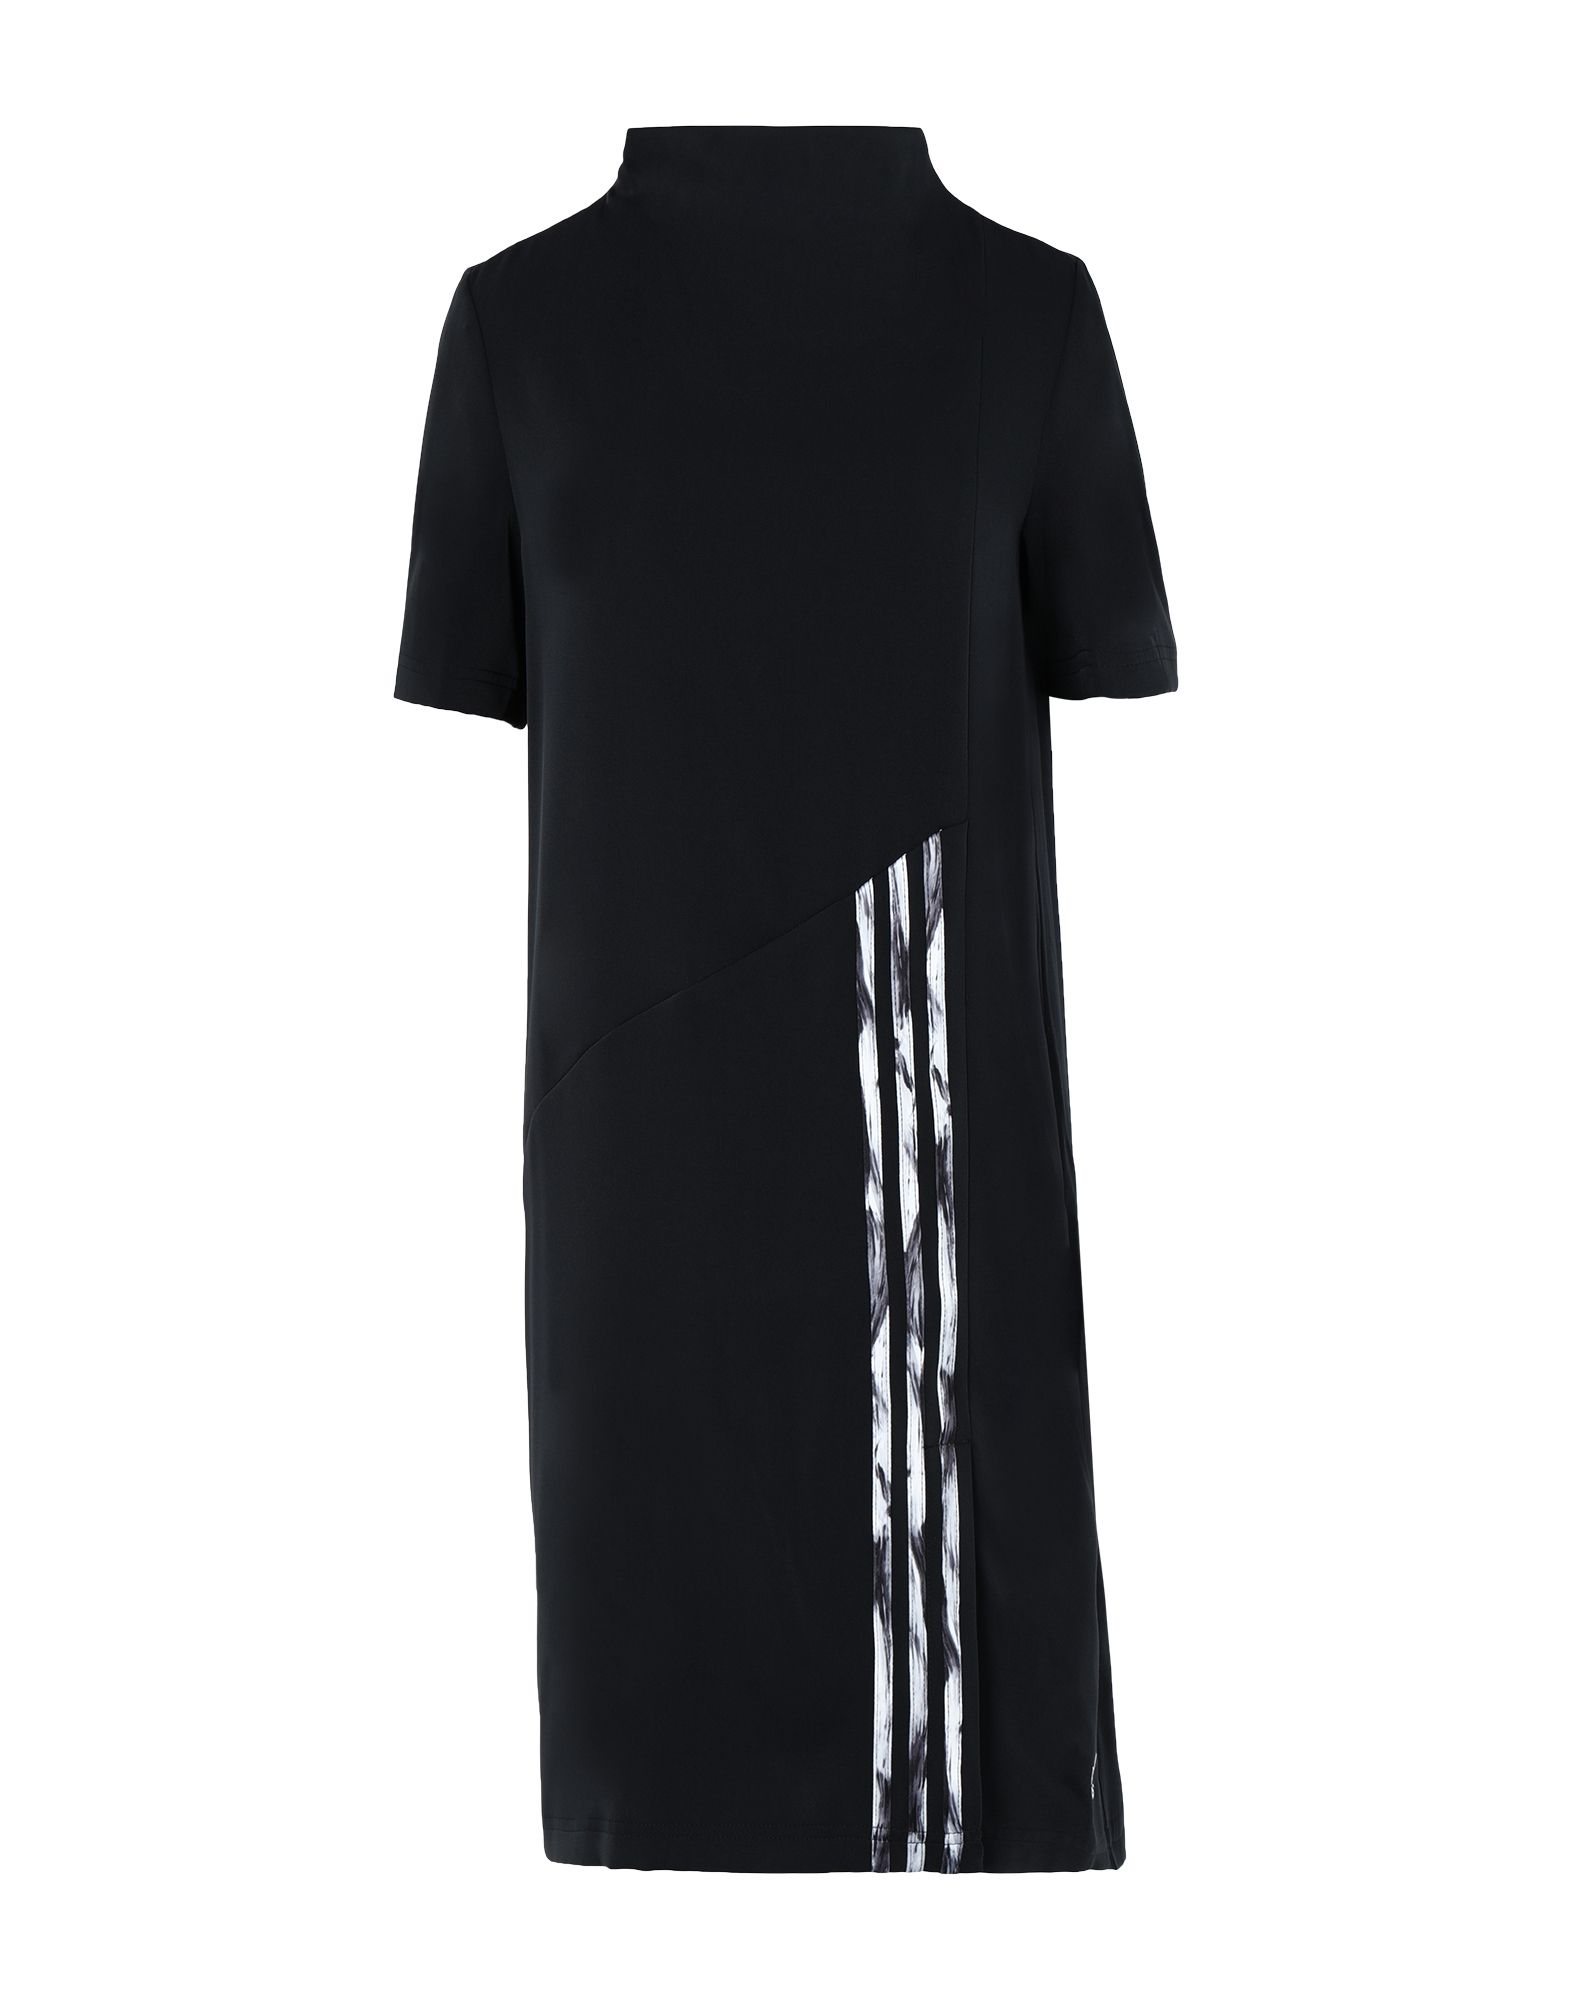 ADIDAS ORIGINALS by DANIËLLE CATHARI Платье до колена цена